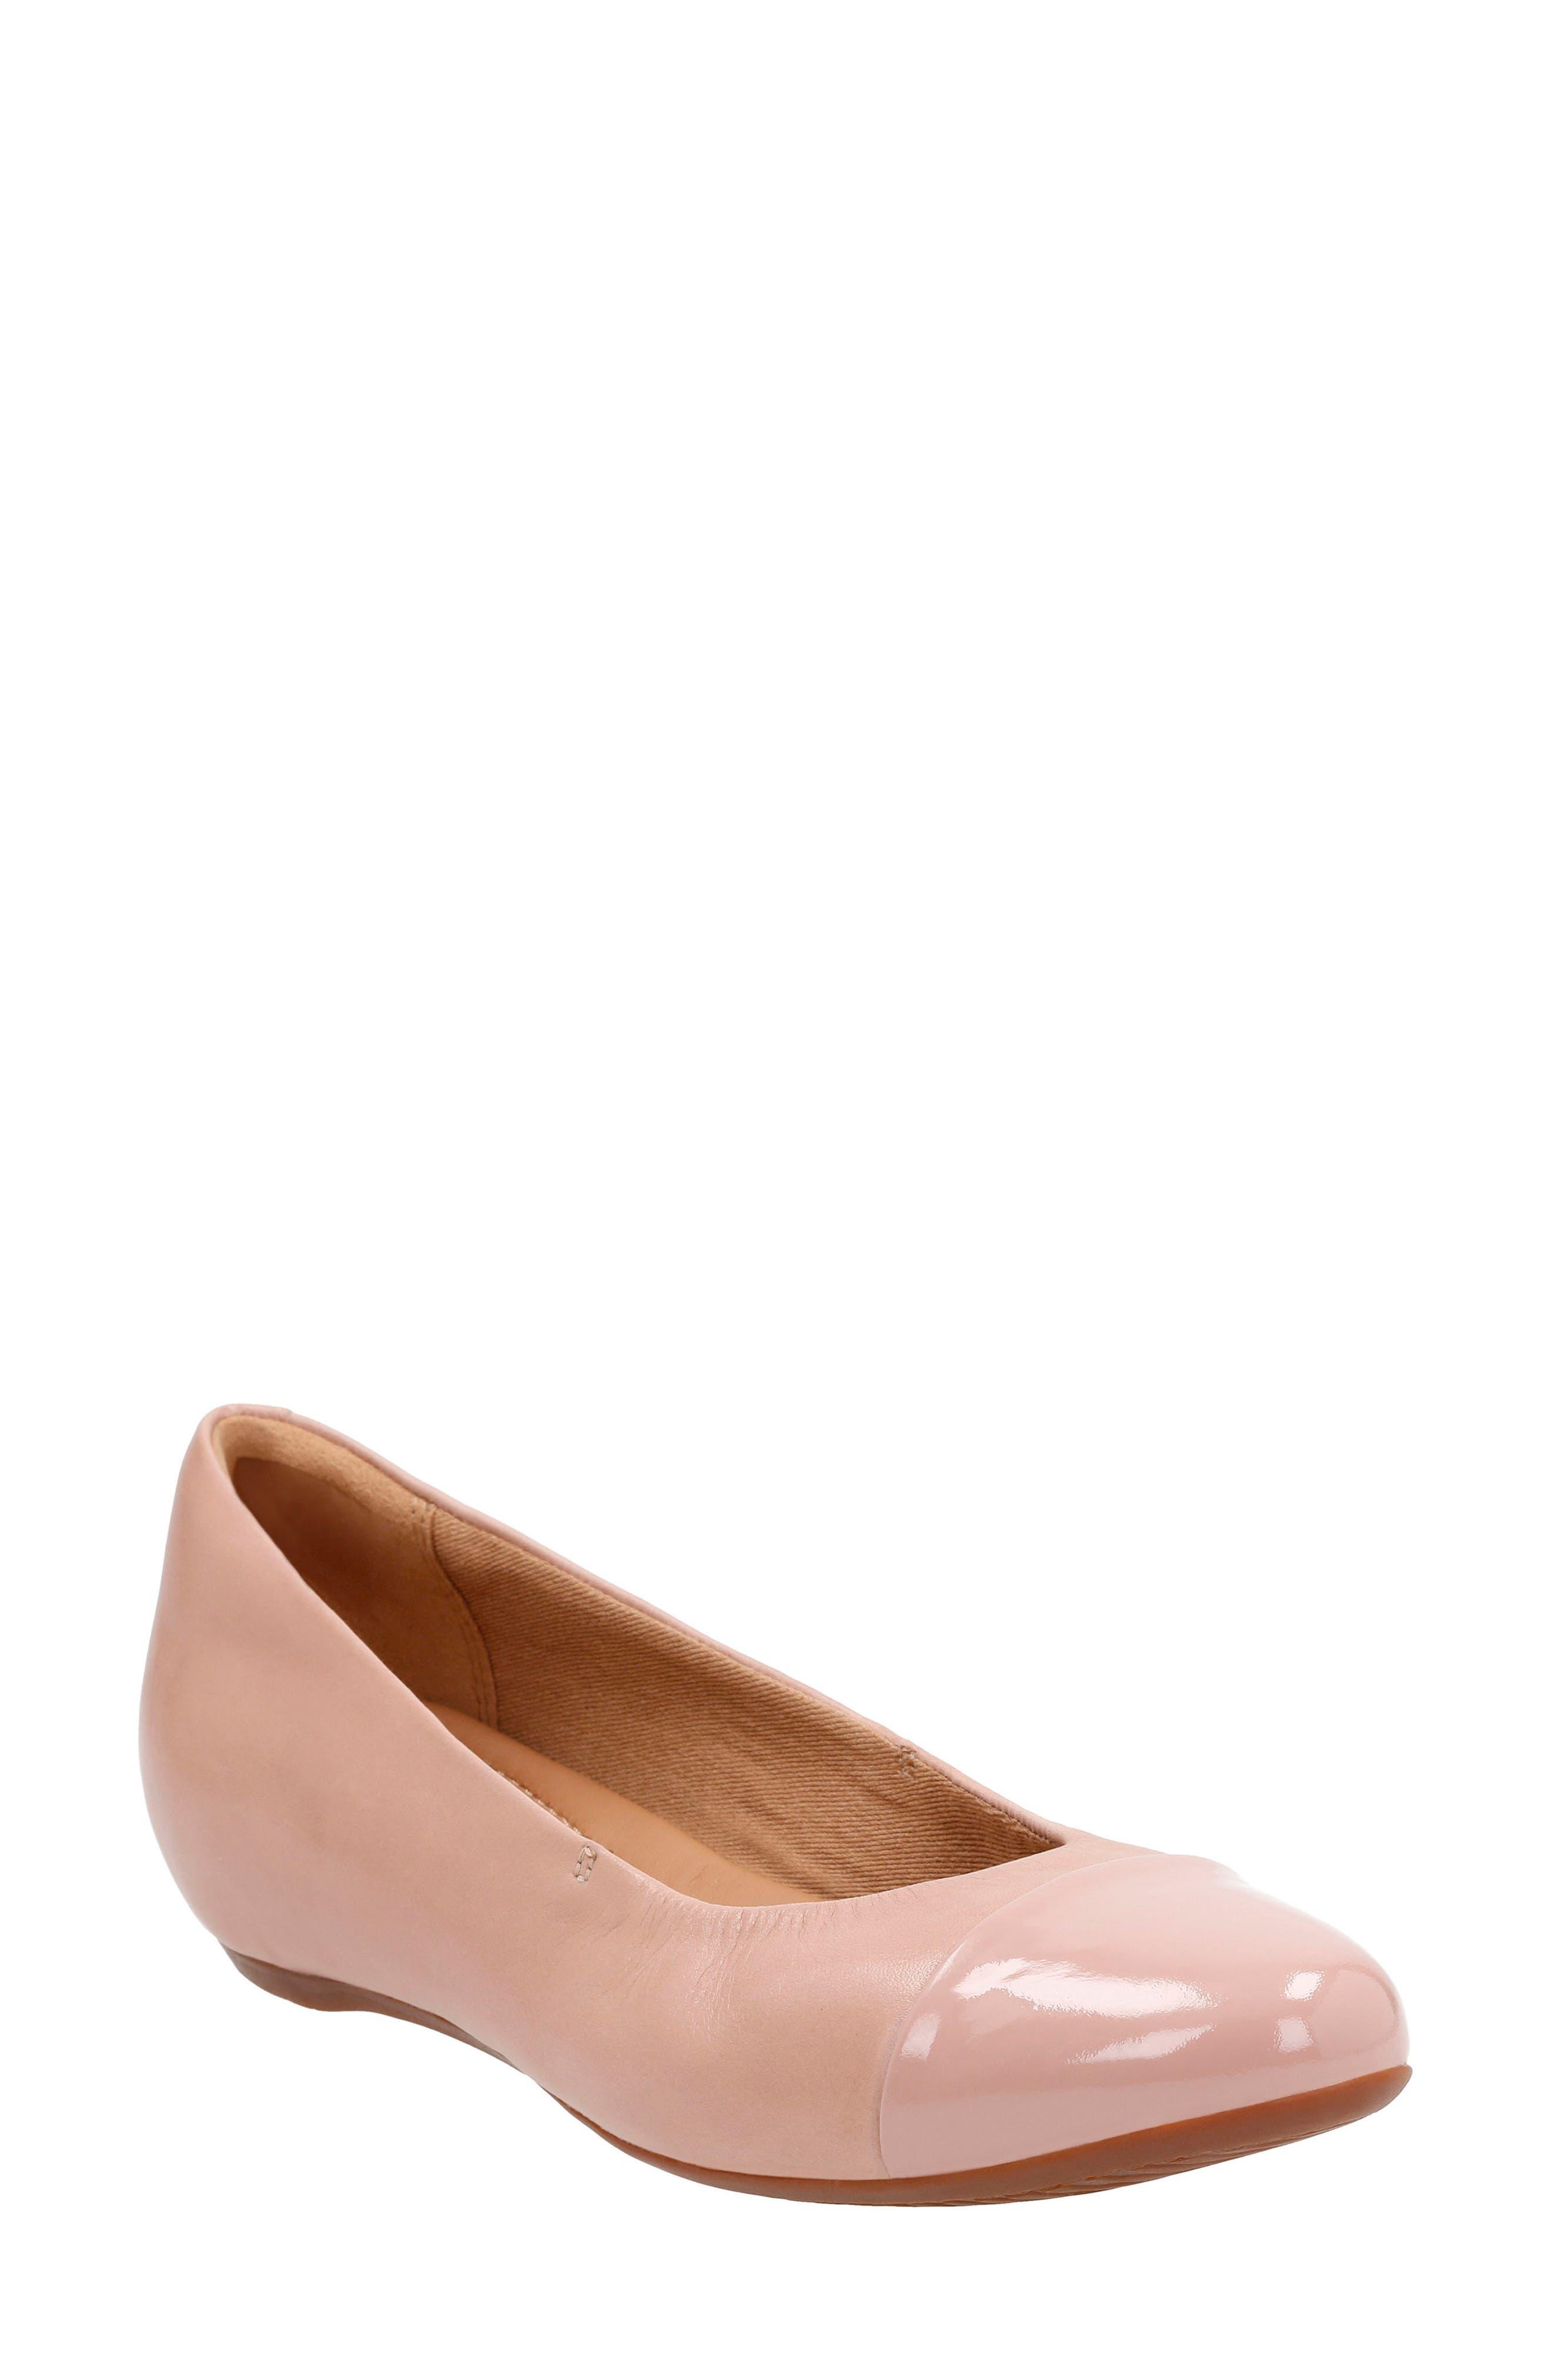 CLARKS<SUP>®</SUP> Alitay Susan Cap Toe Flat